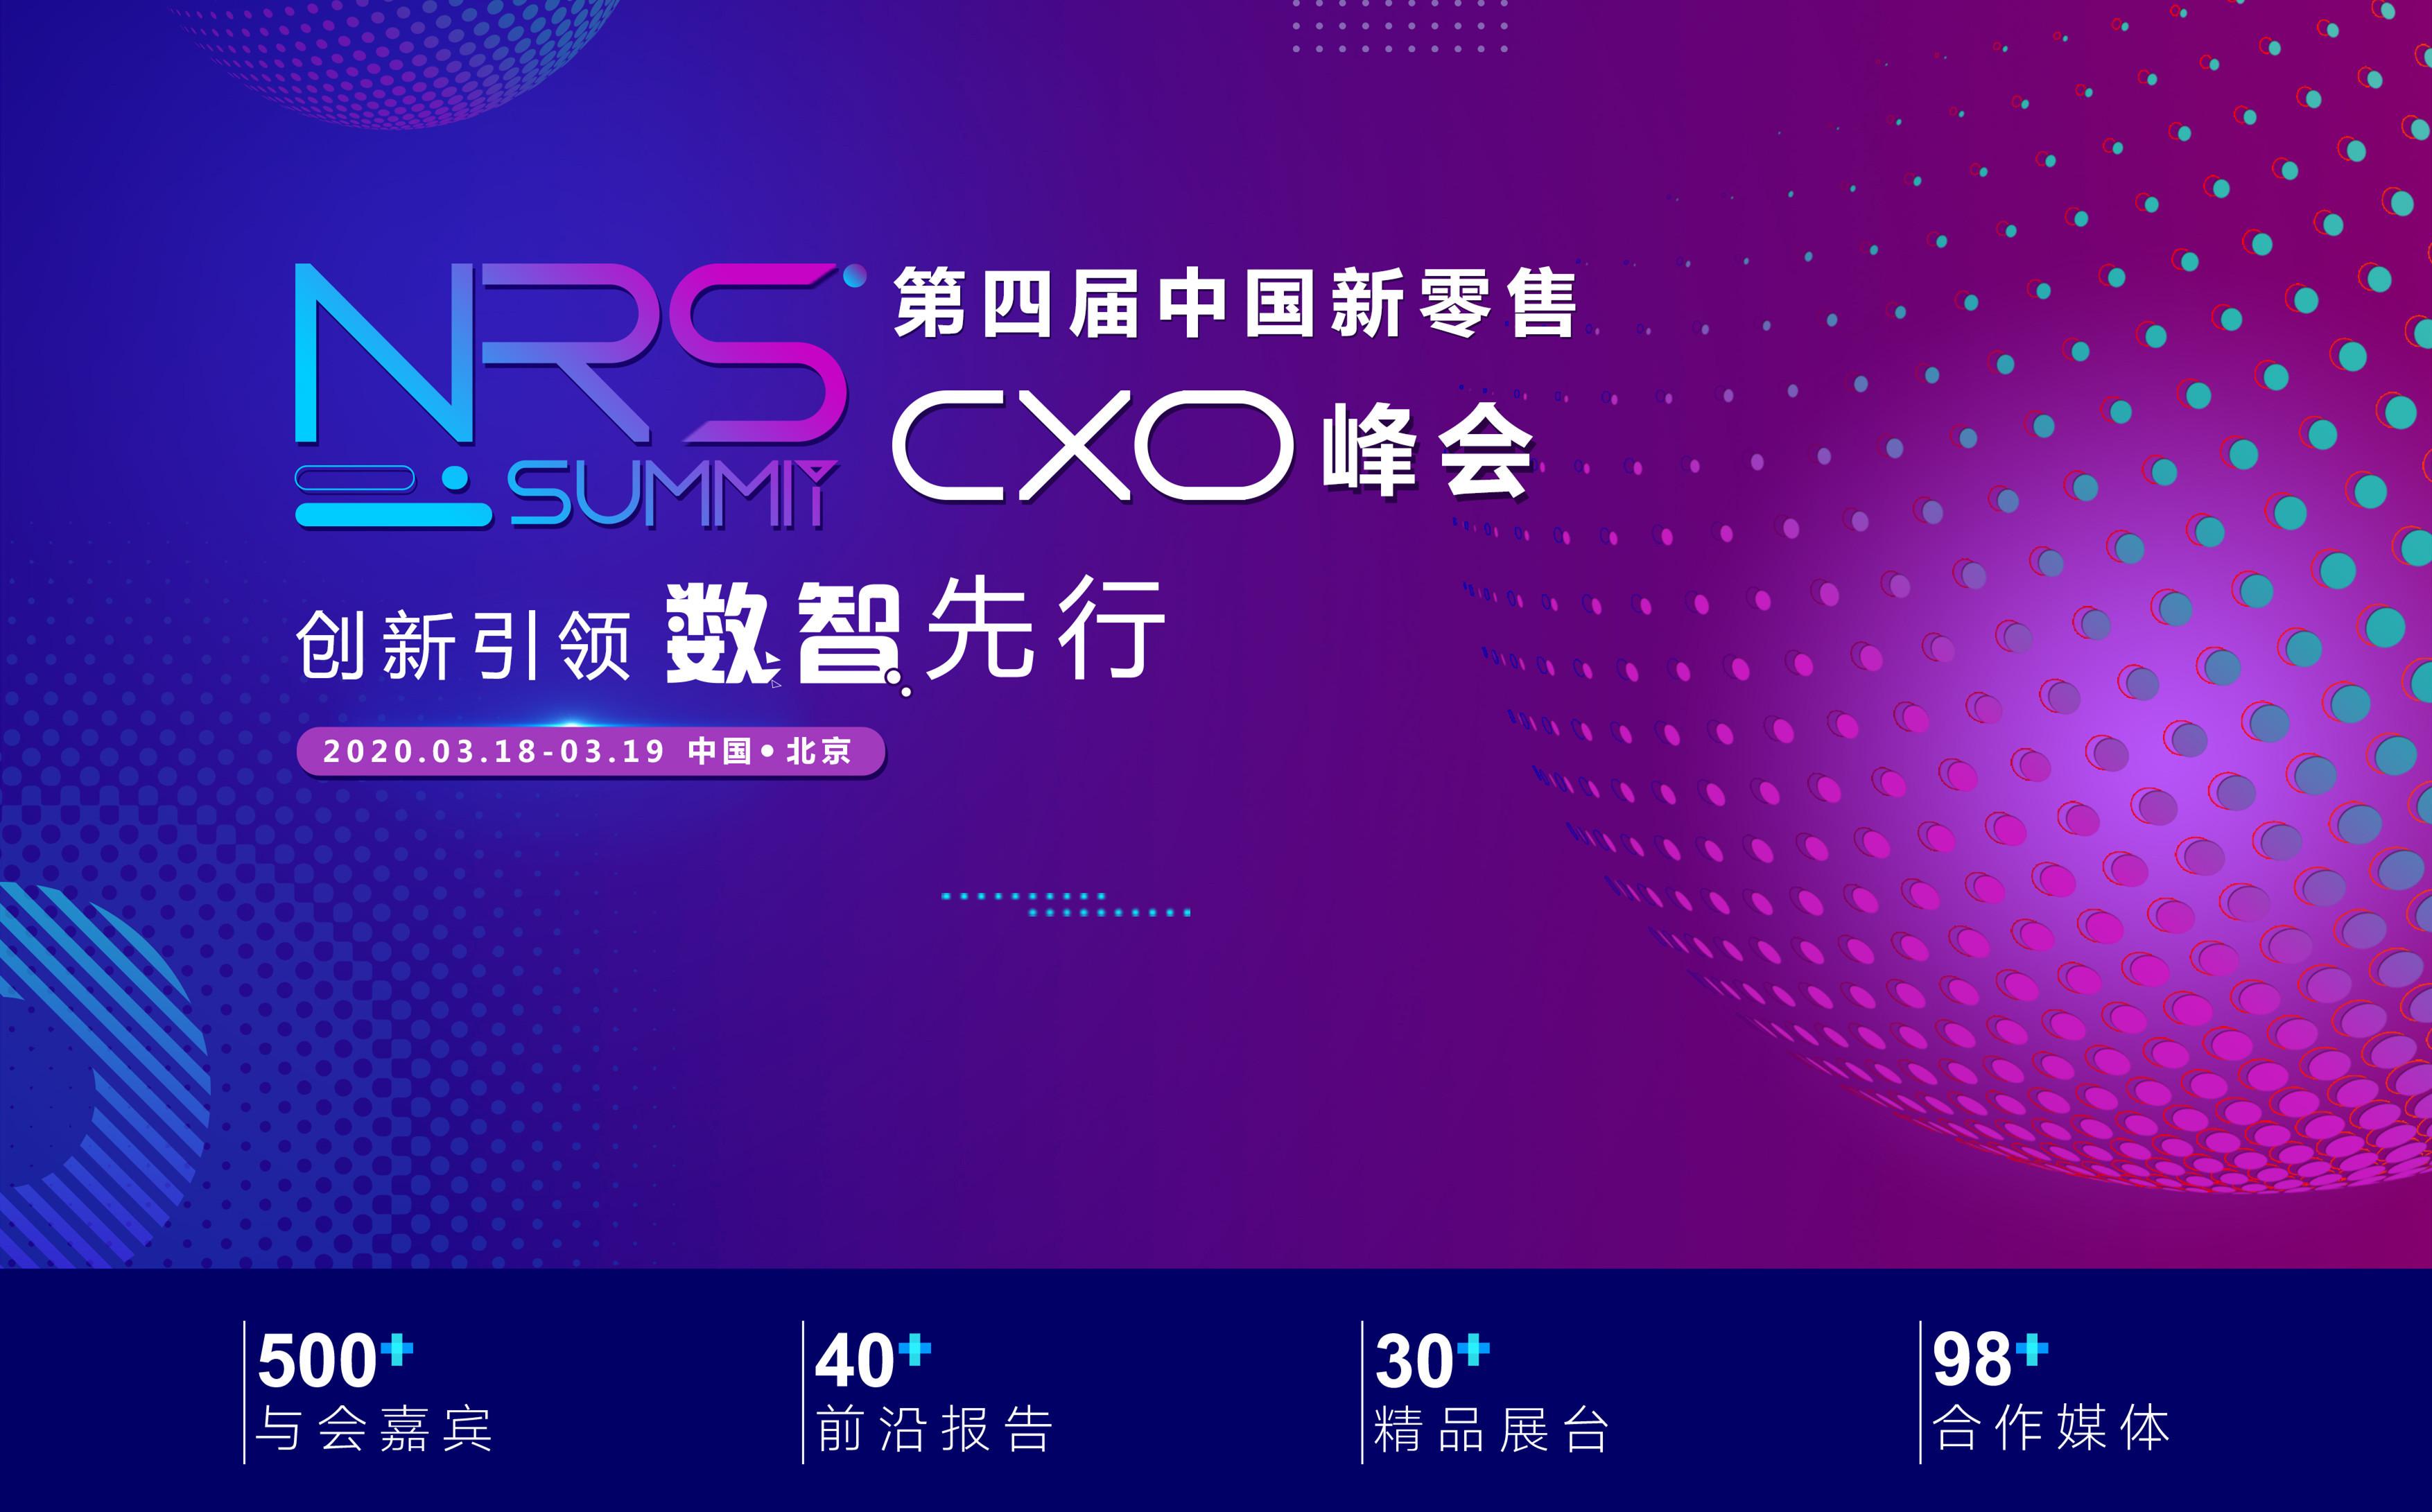 NRS 2020第四届中国新零售CXO峰会(北京)